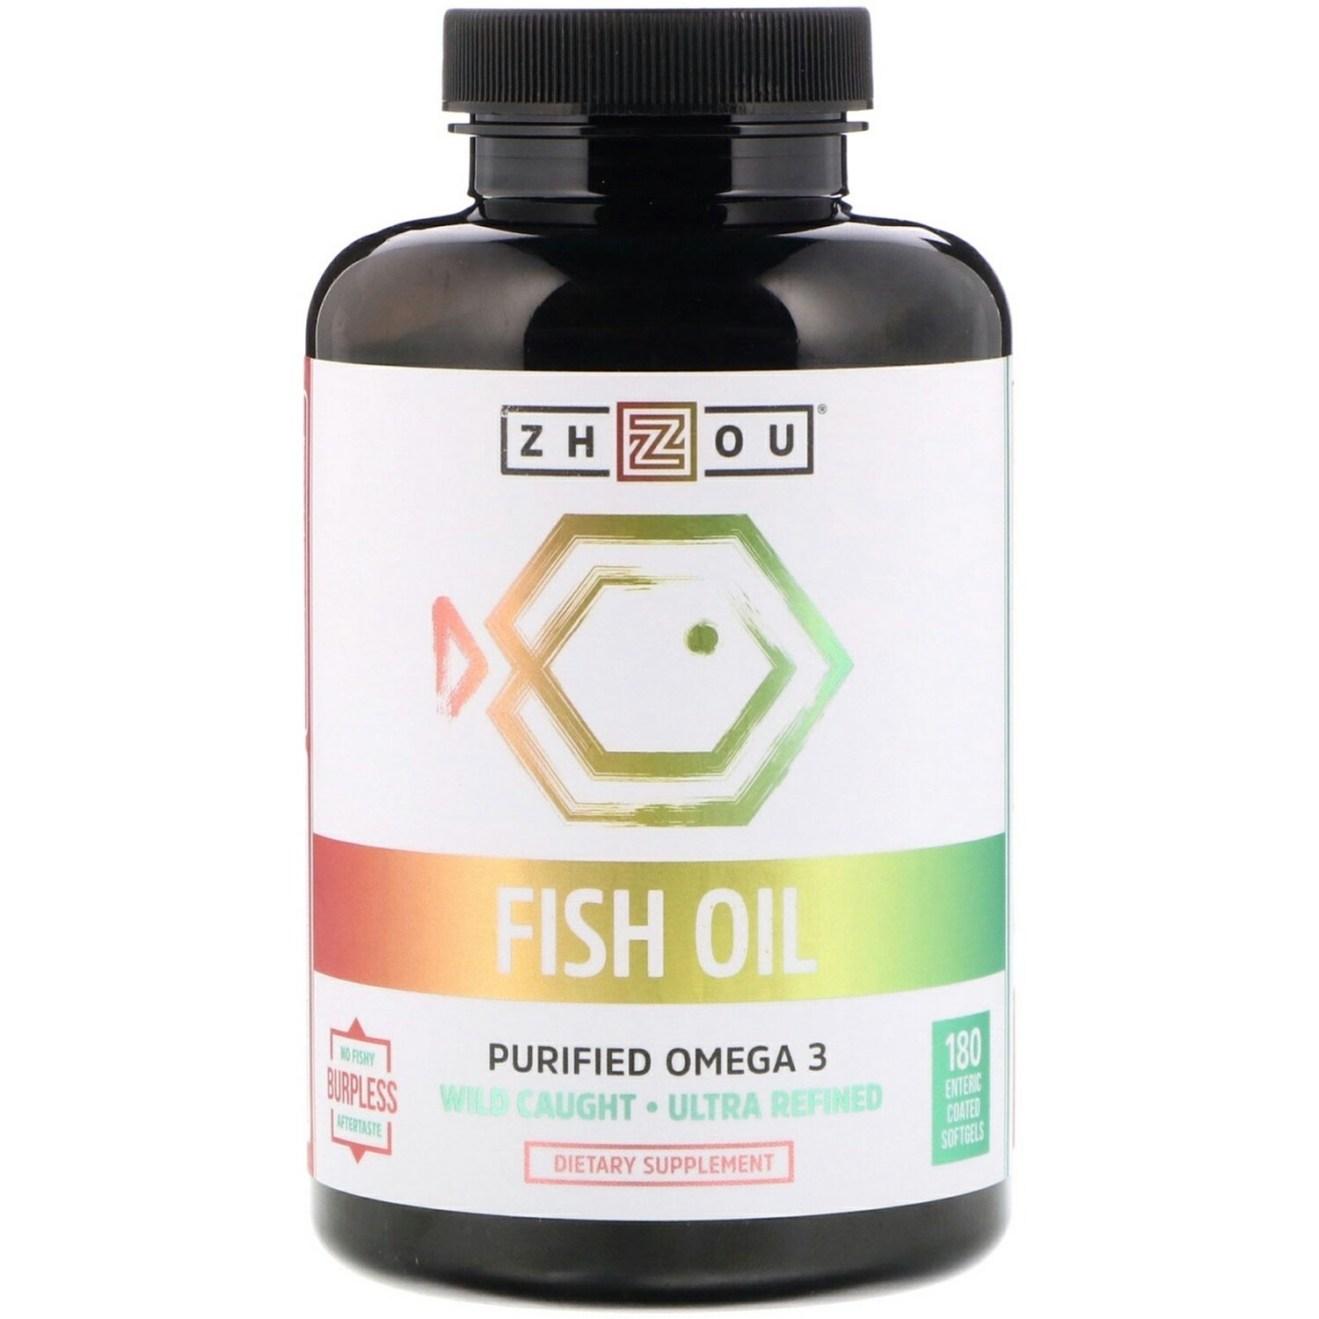 Zhou Fish Oil